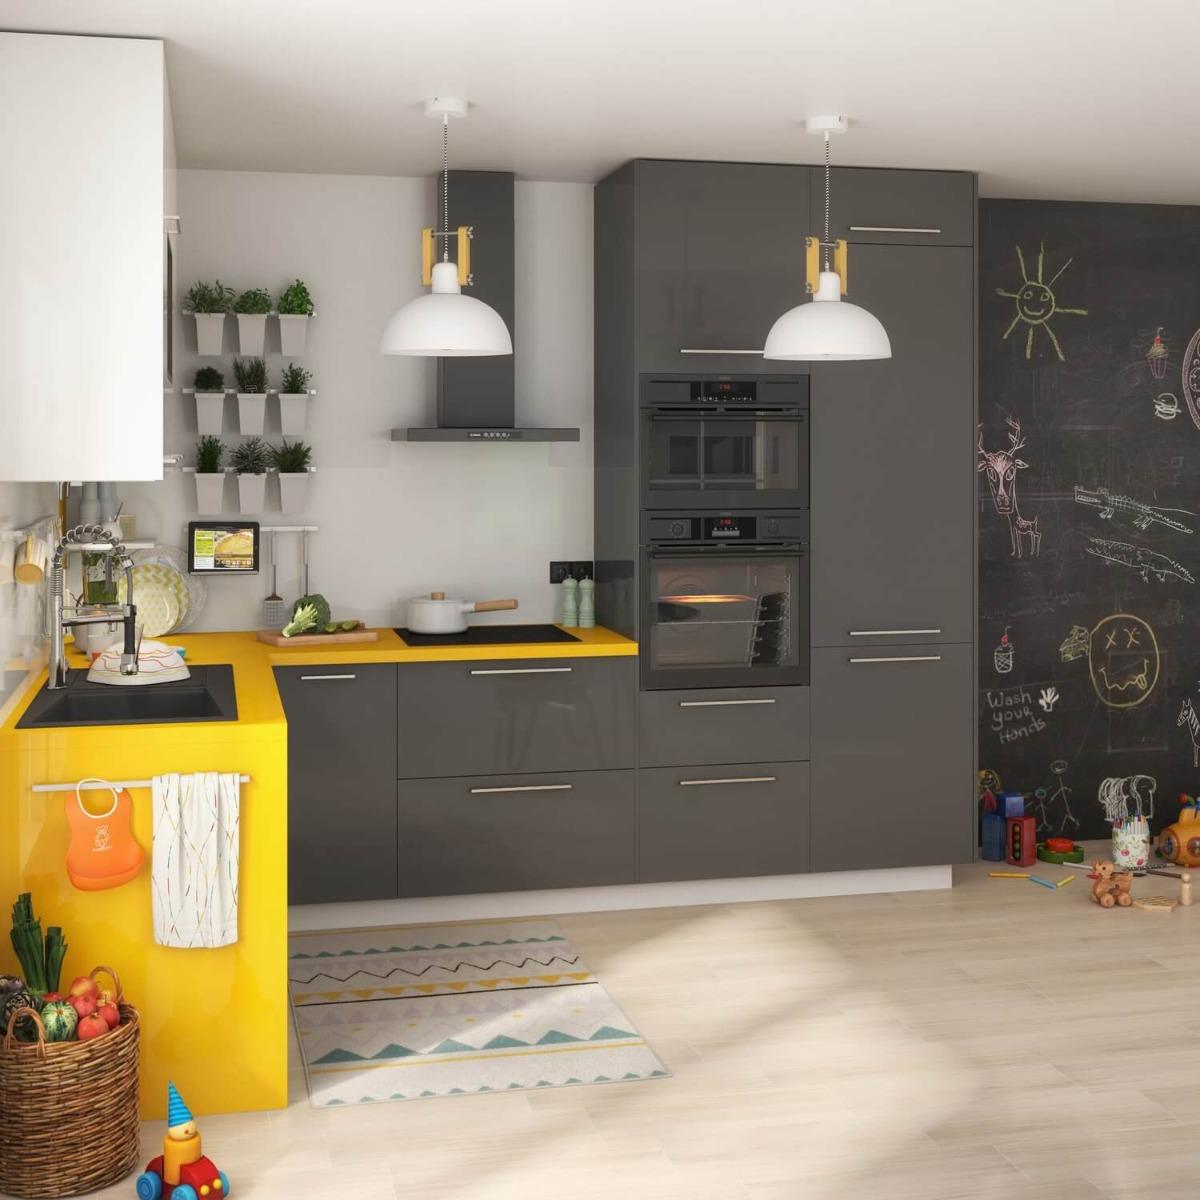 Delinia Sevilla Grey Designer Kitchen Mobi - Example 2